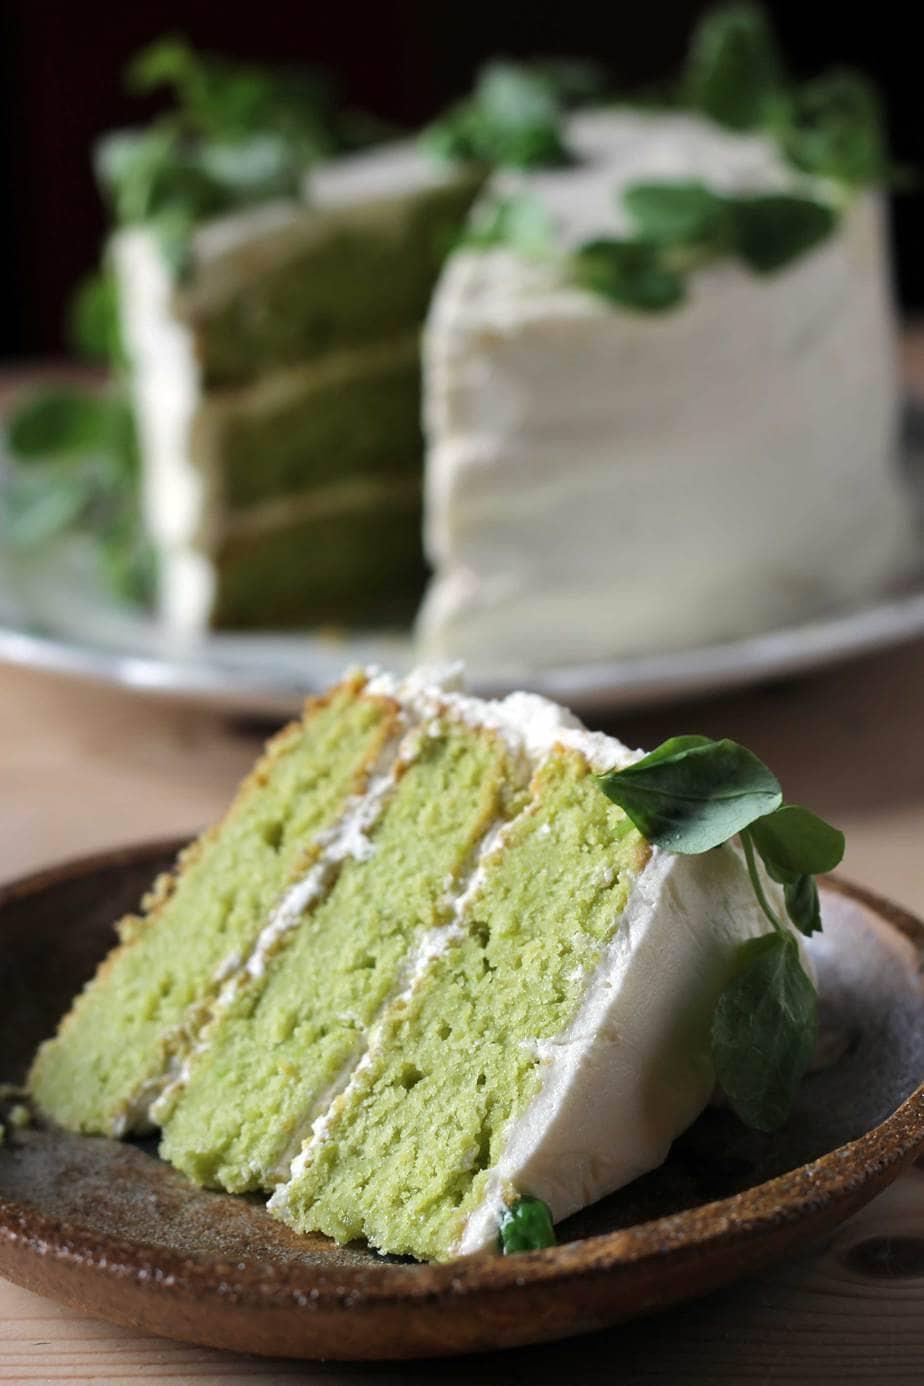 A slice of cake close up.